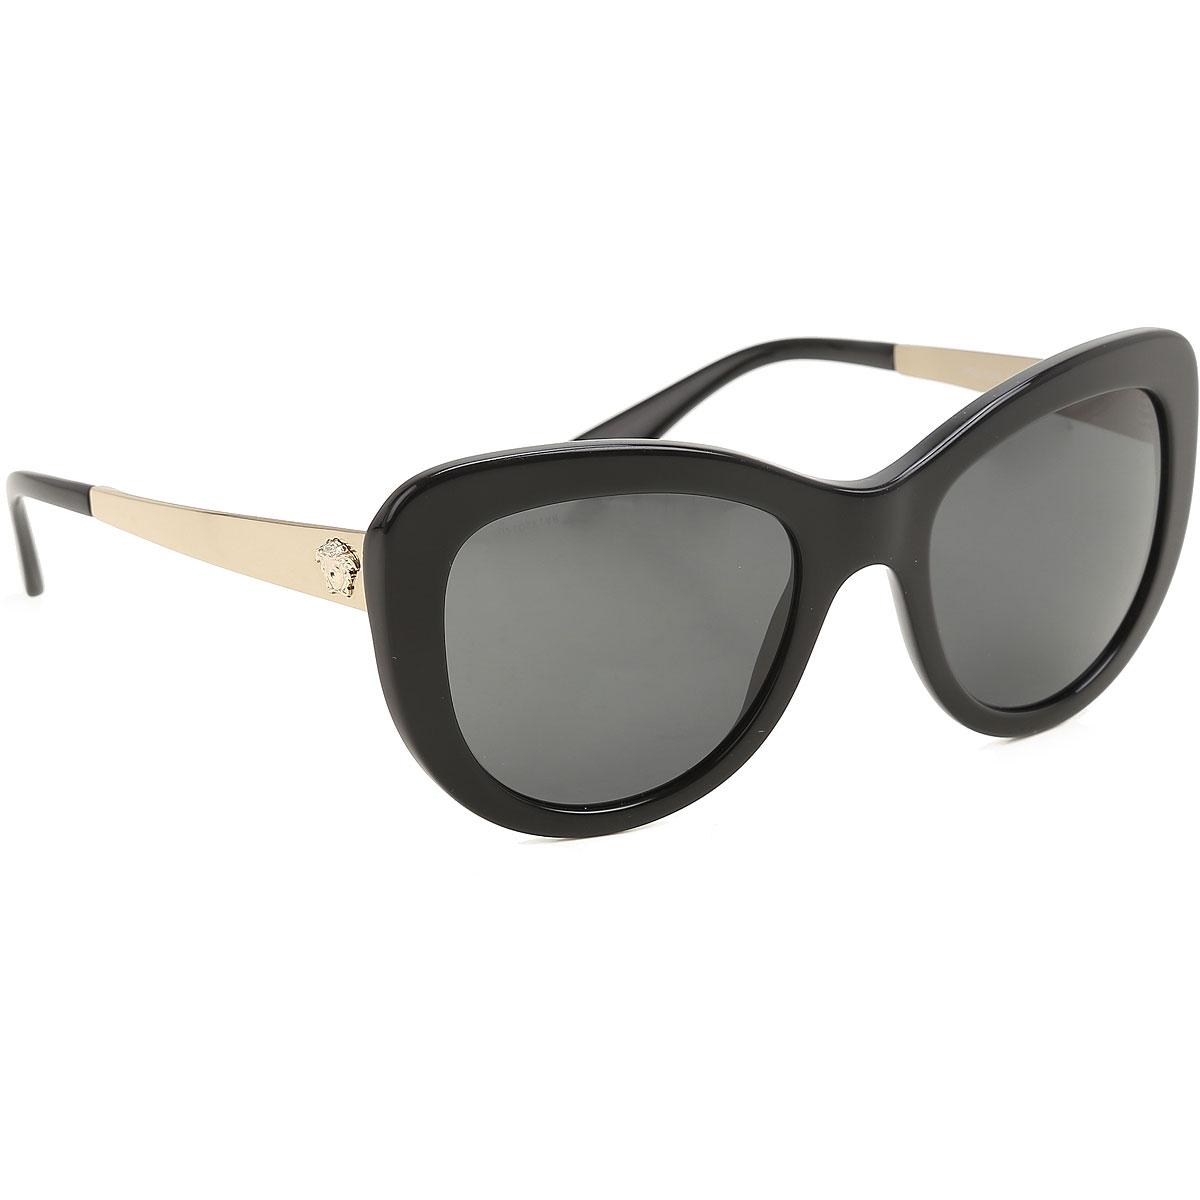 Gianni Versace Sunglasses On Sale, Black, 2019